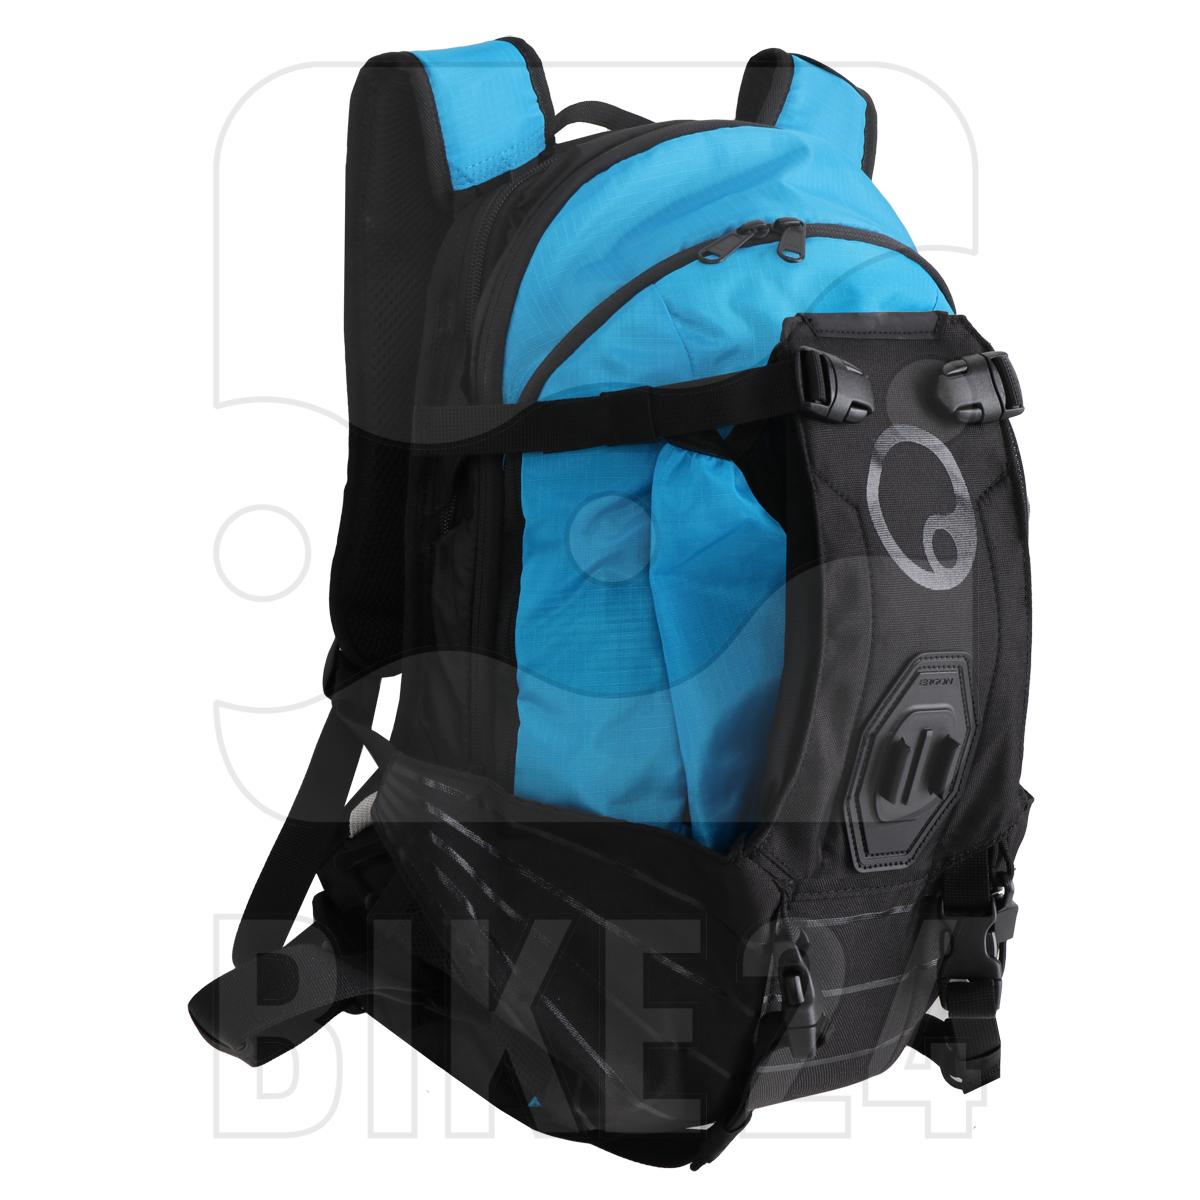 Ergon BA2 Enduro Backpack - ST-black / blue